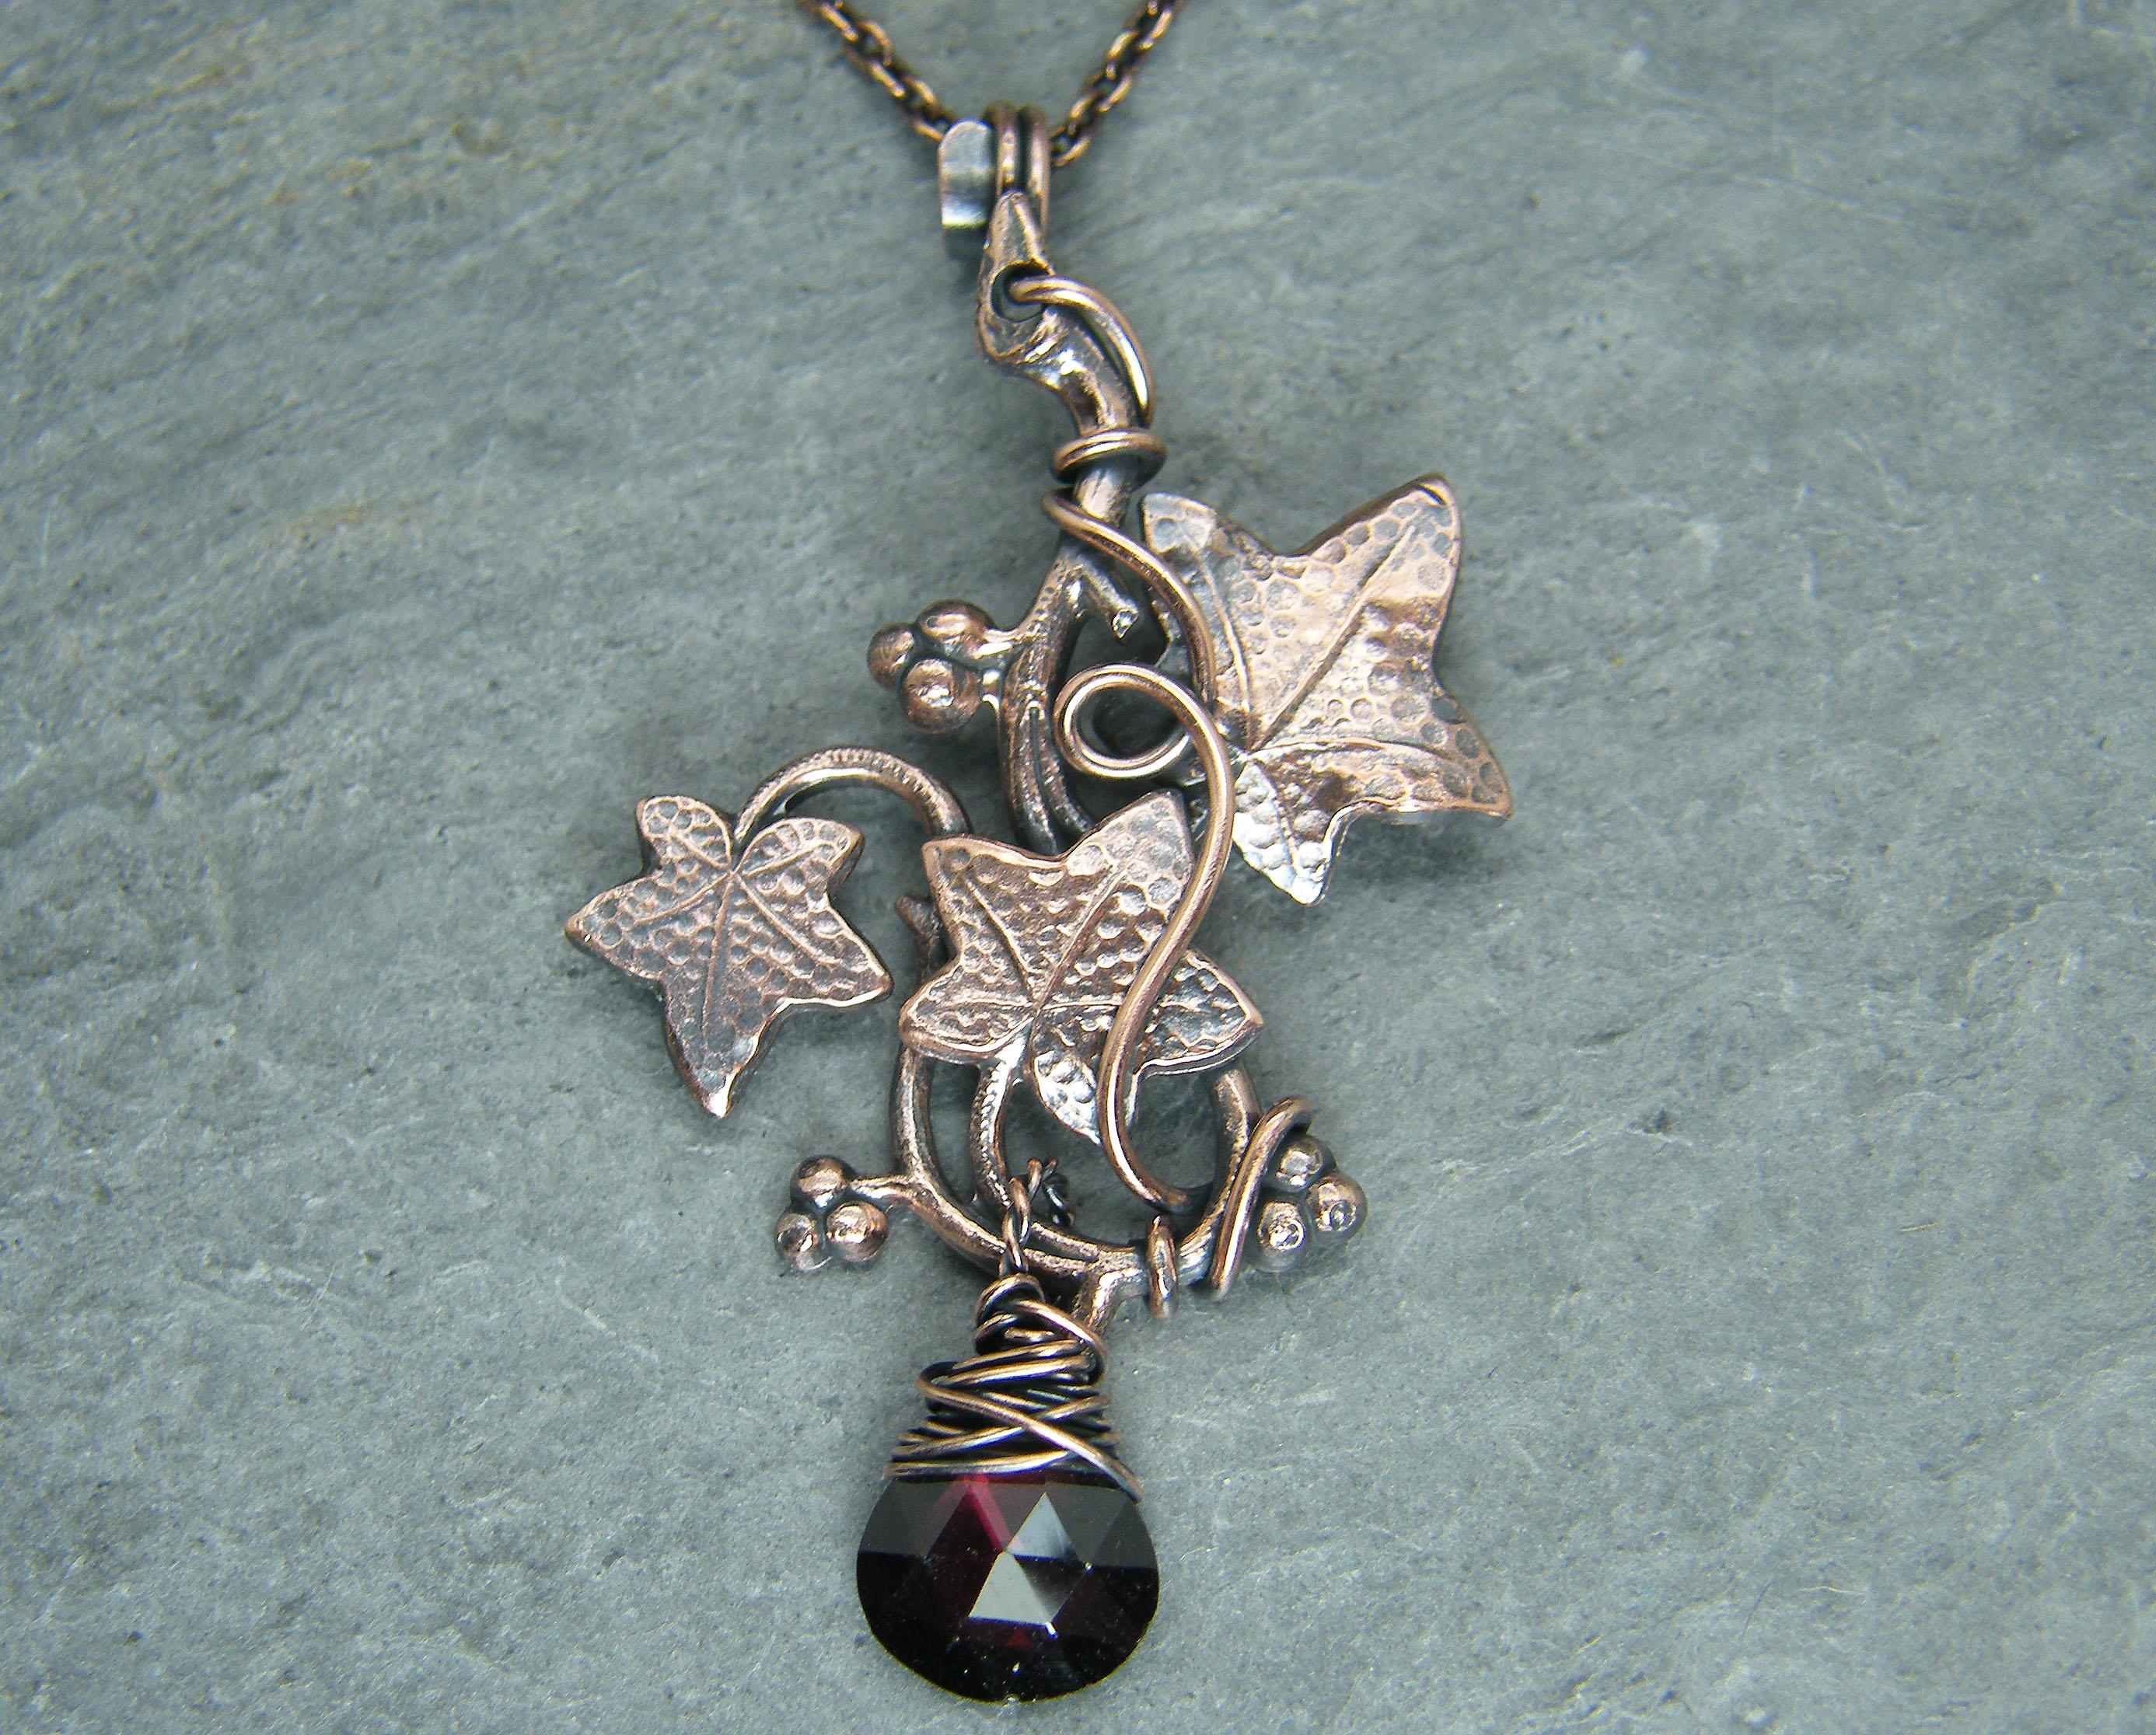 Leaf necklace, Garnet necklace, Birthstone necklace with garnet